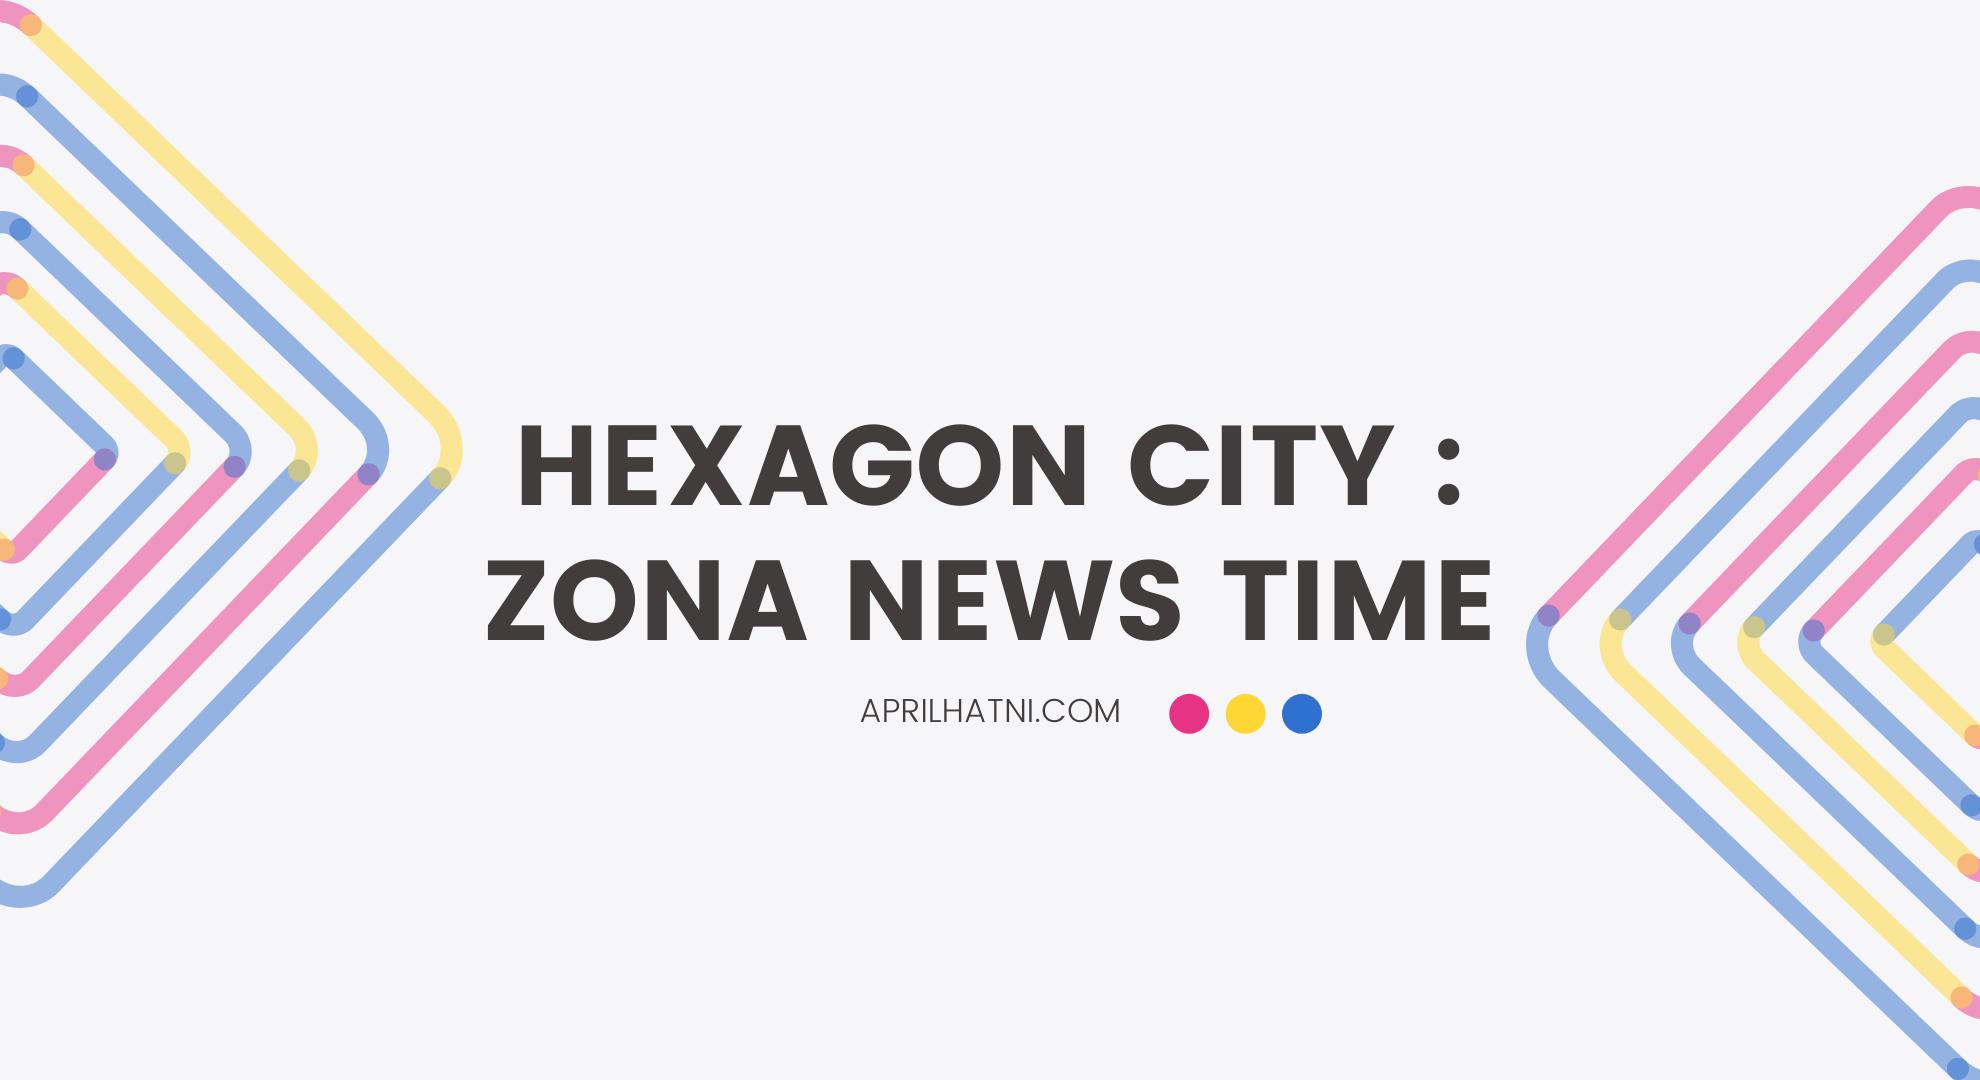 hexagon city zona news time